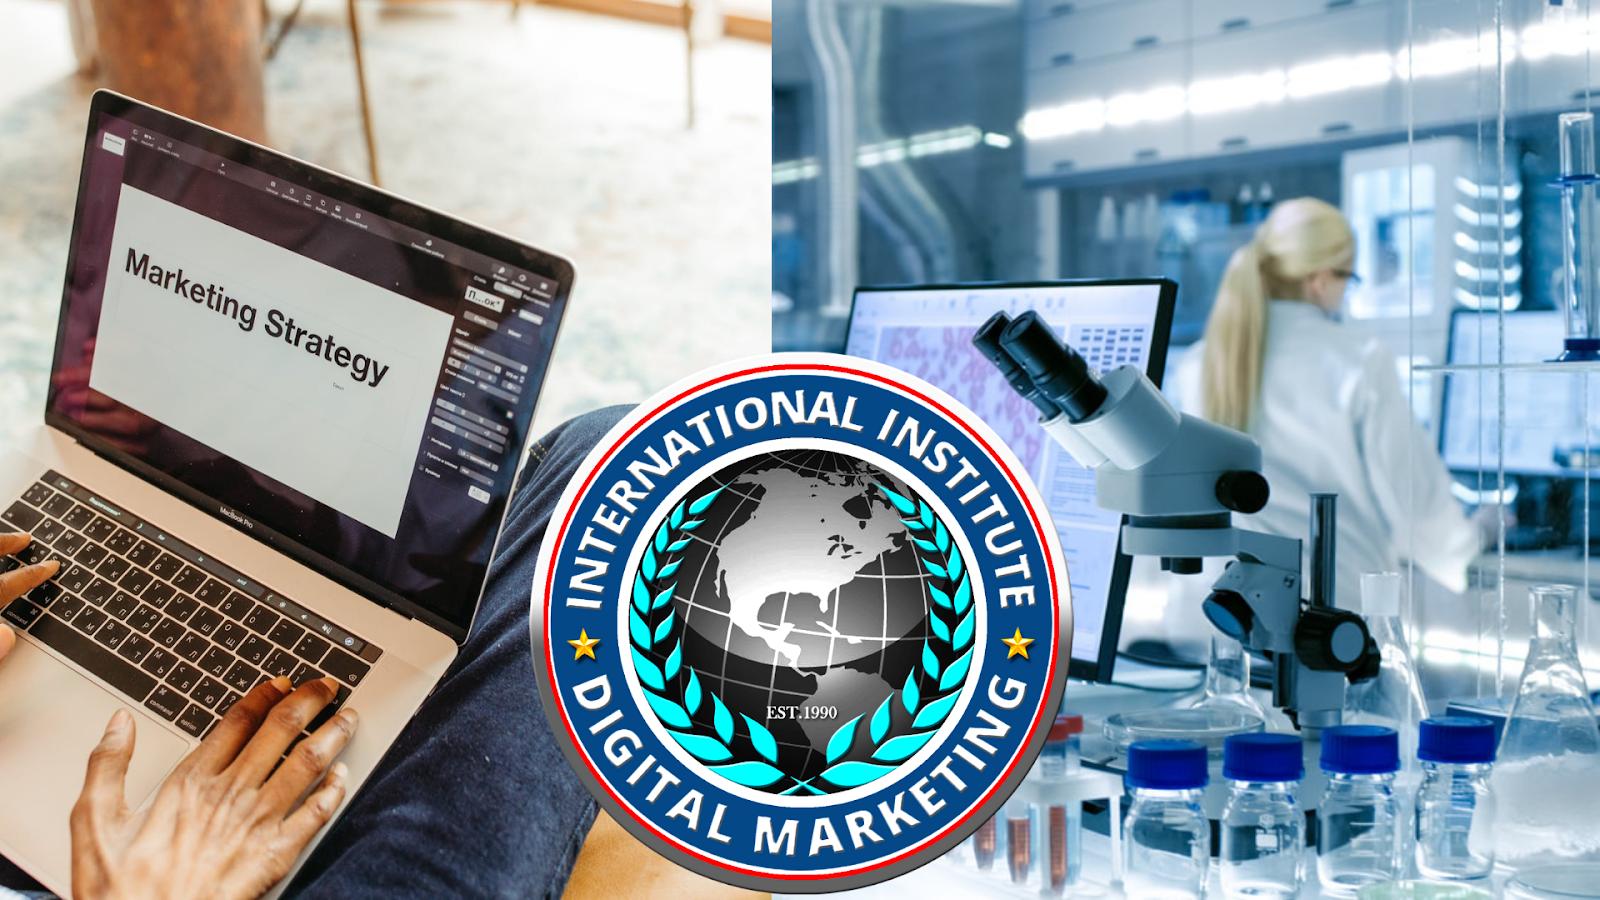 marketing strategies, international institute of digital marketing logo, medical laboratory